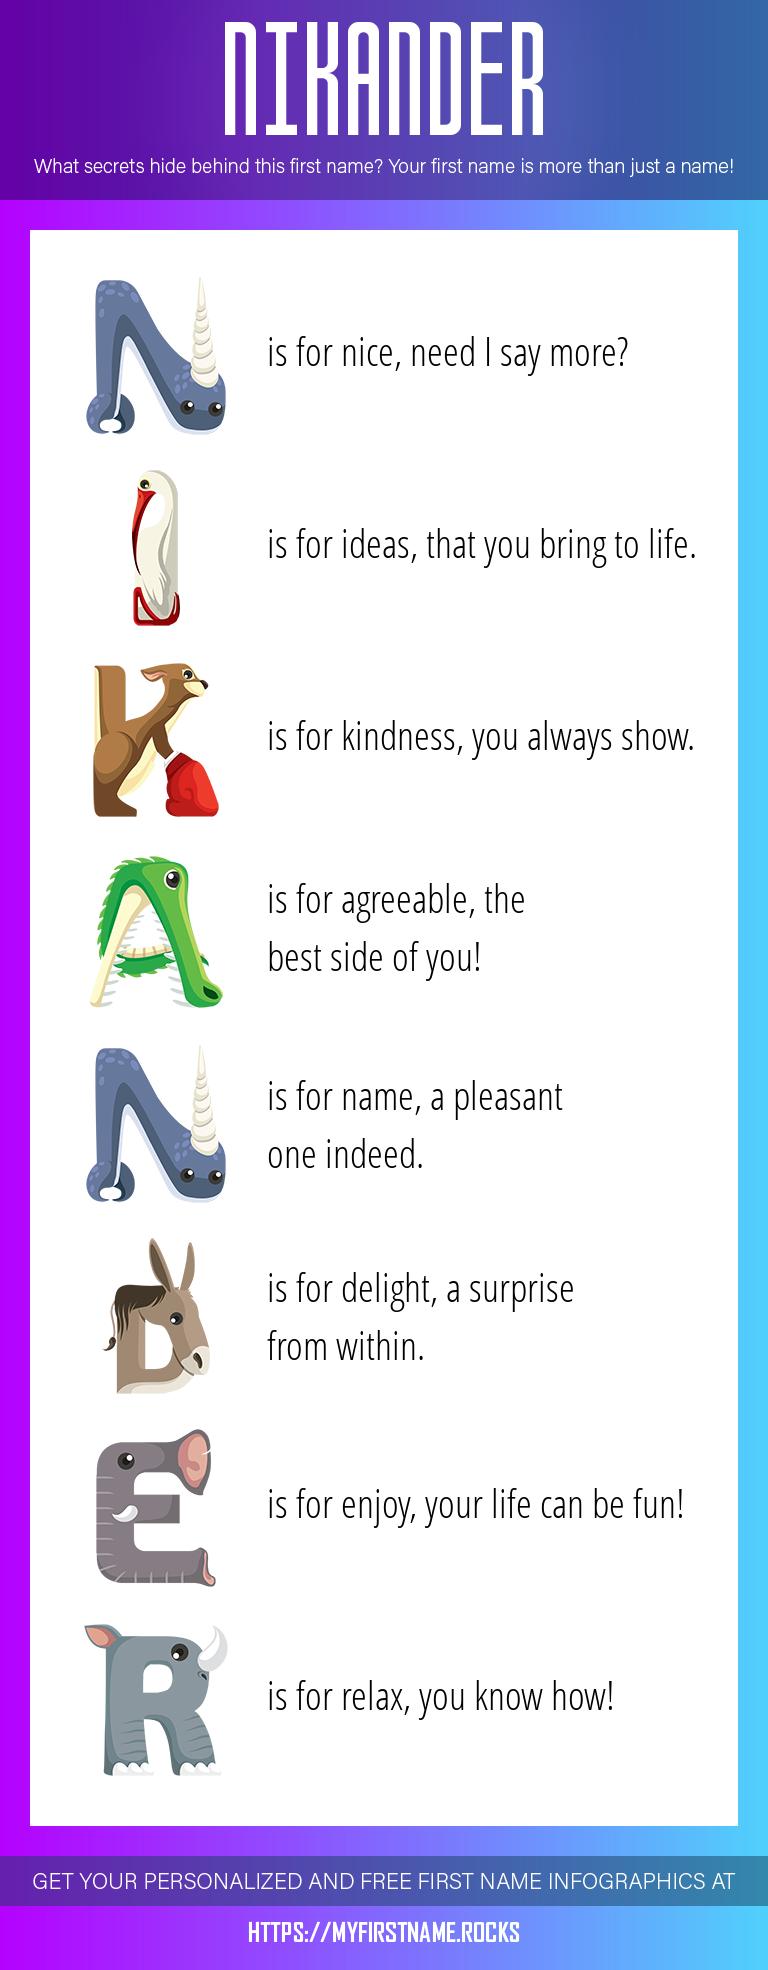 Nikander Infographics